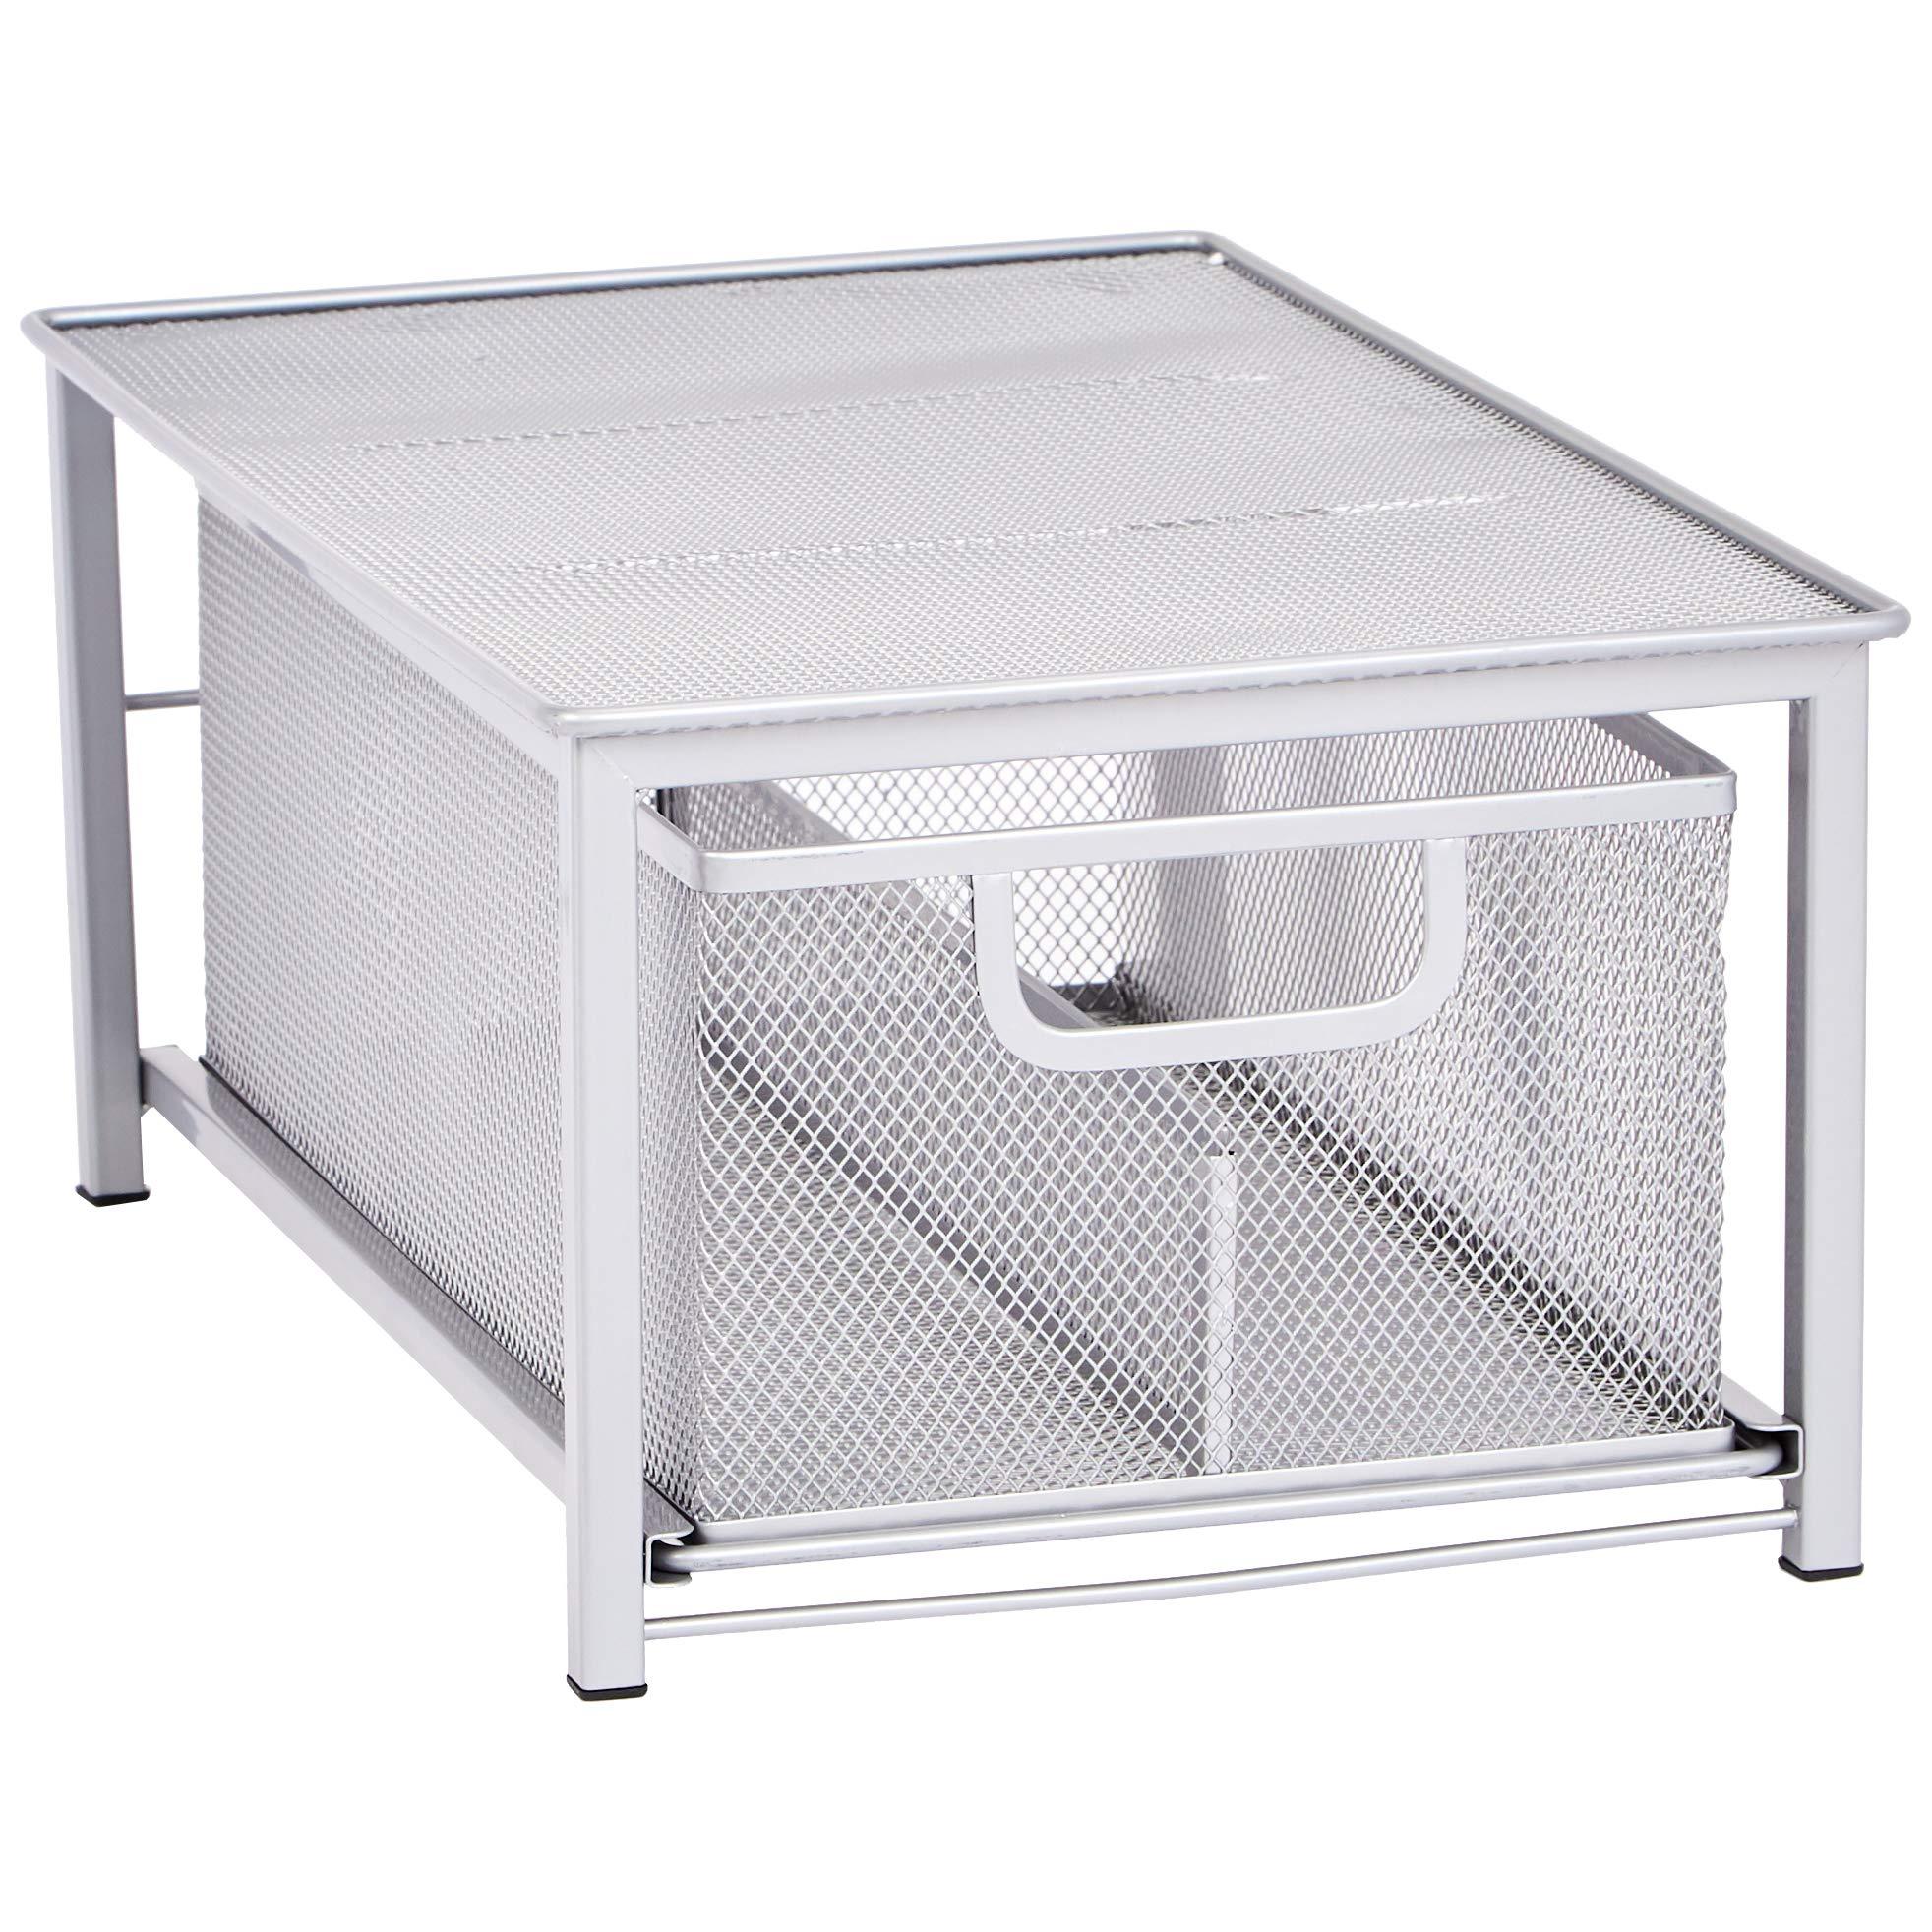 Amazon Basics Mesh Sliding Basket Drawer Storage Shelf Organizer, Silver